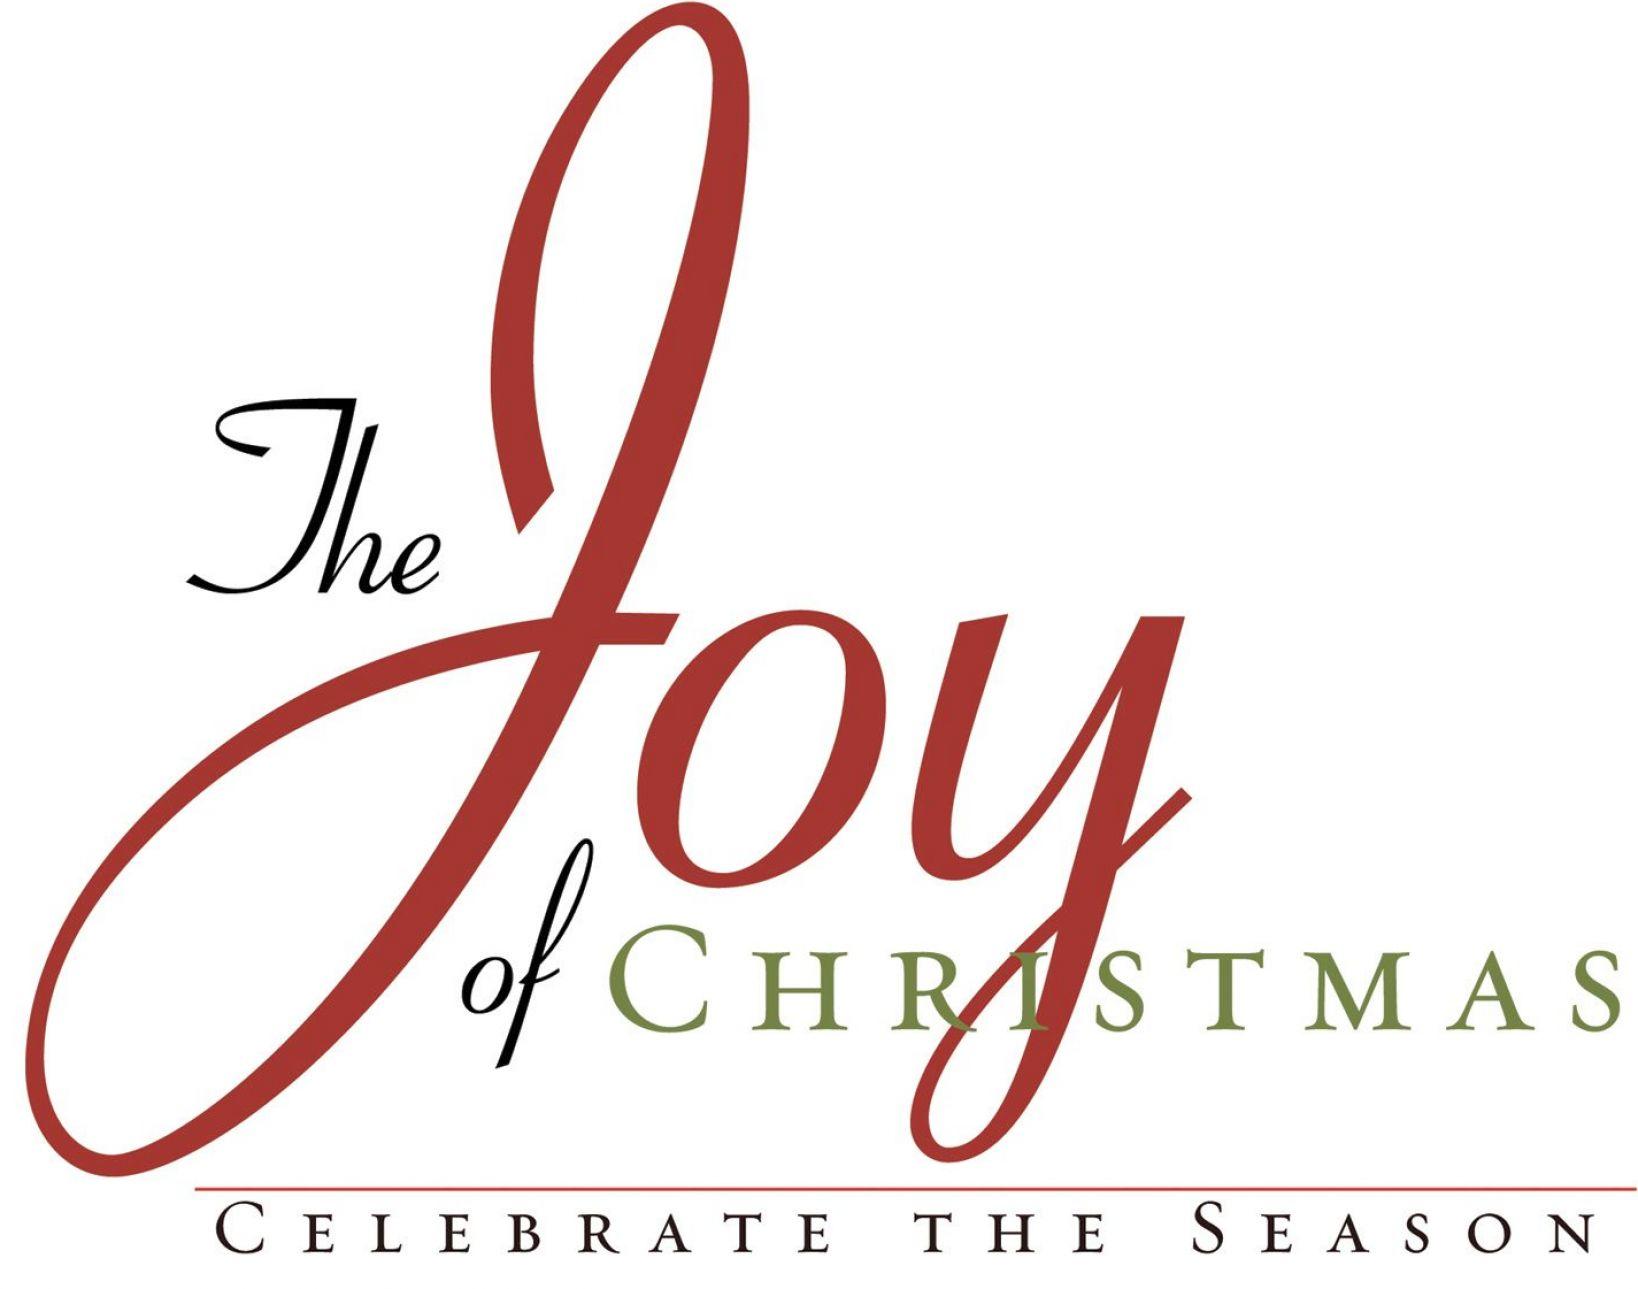 Religious Christian Christmas Clip Art